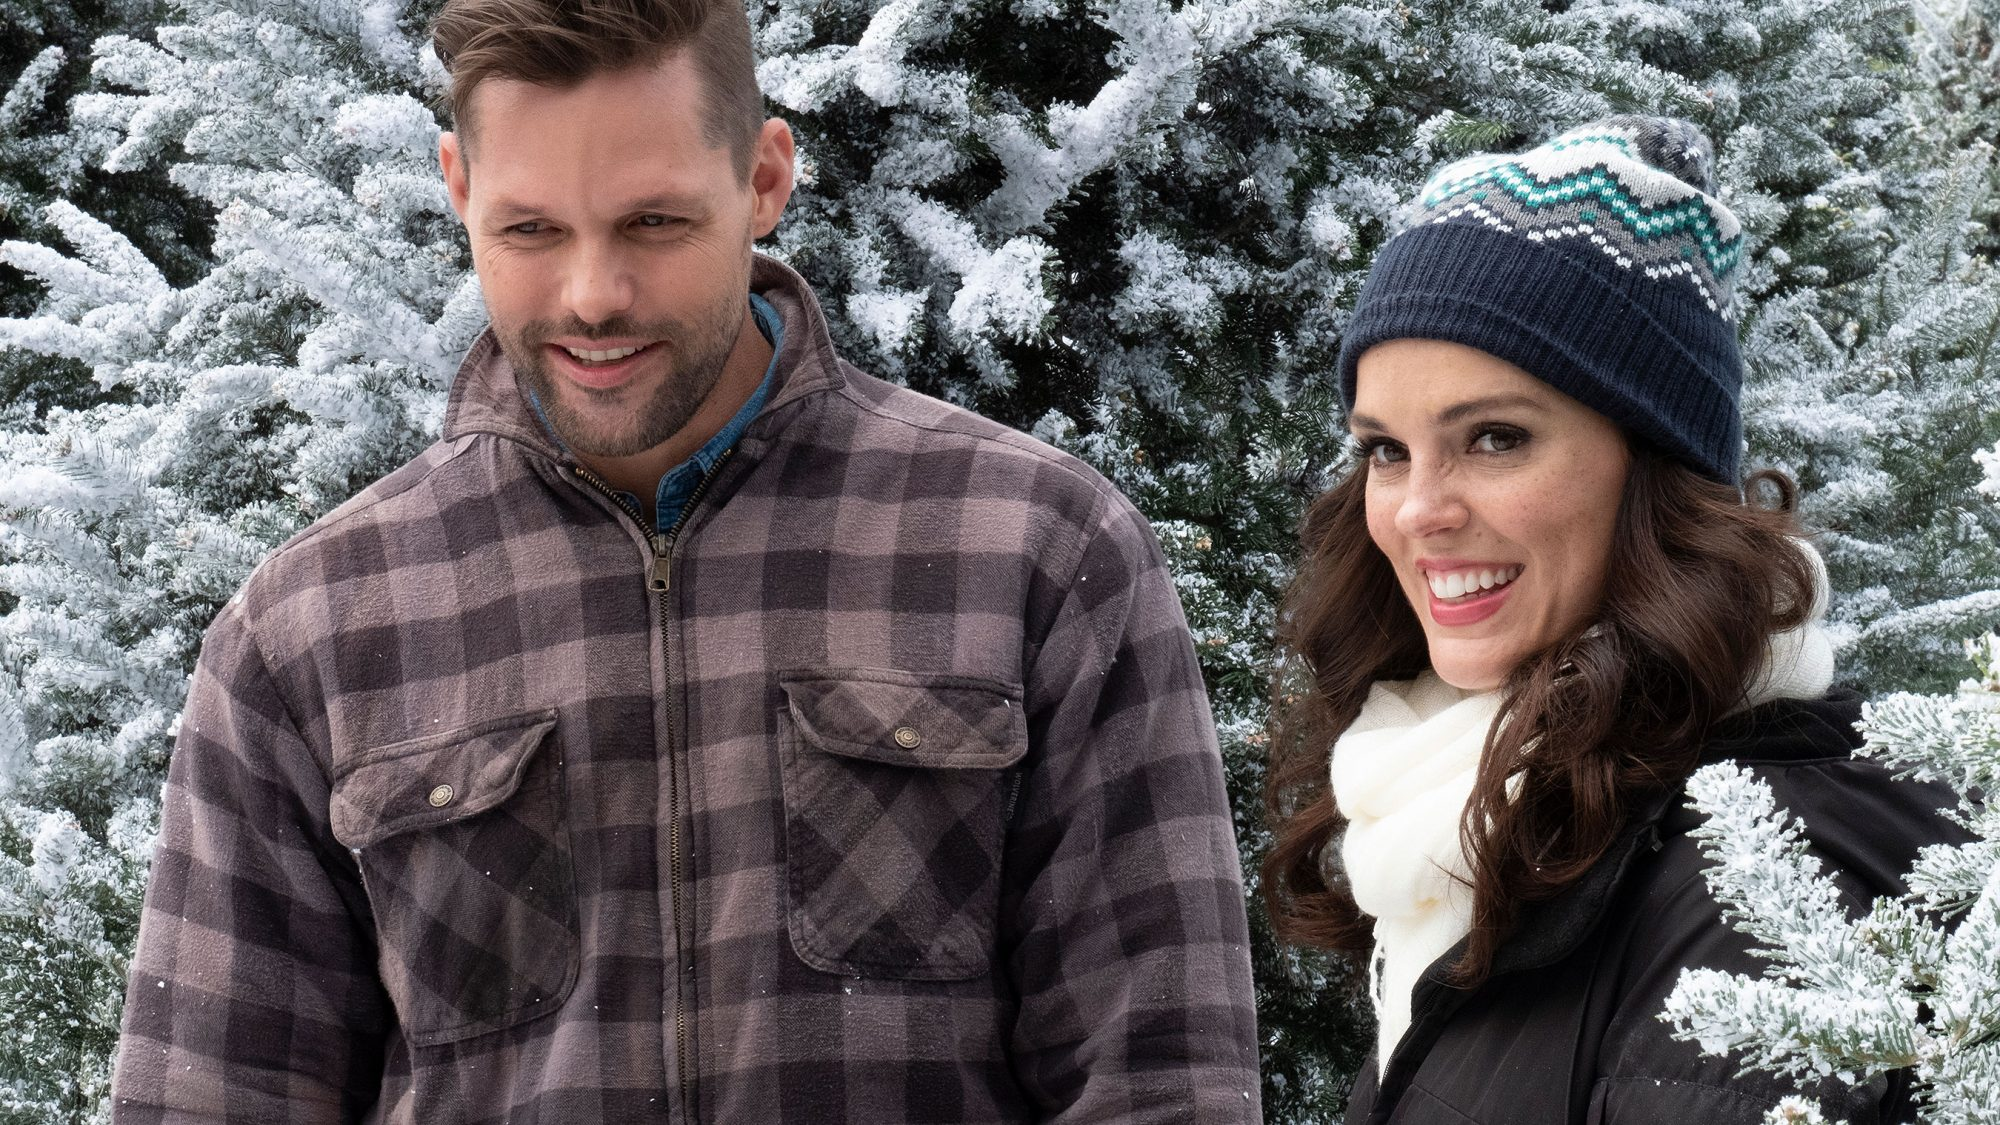 Last Vermont ChristmasCredit: Hallmark